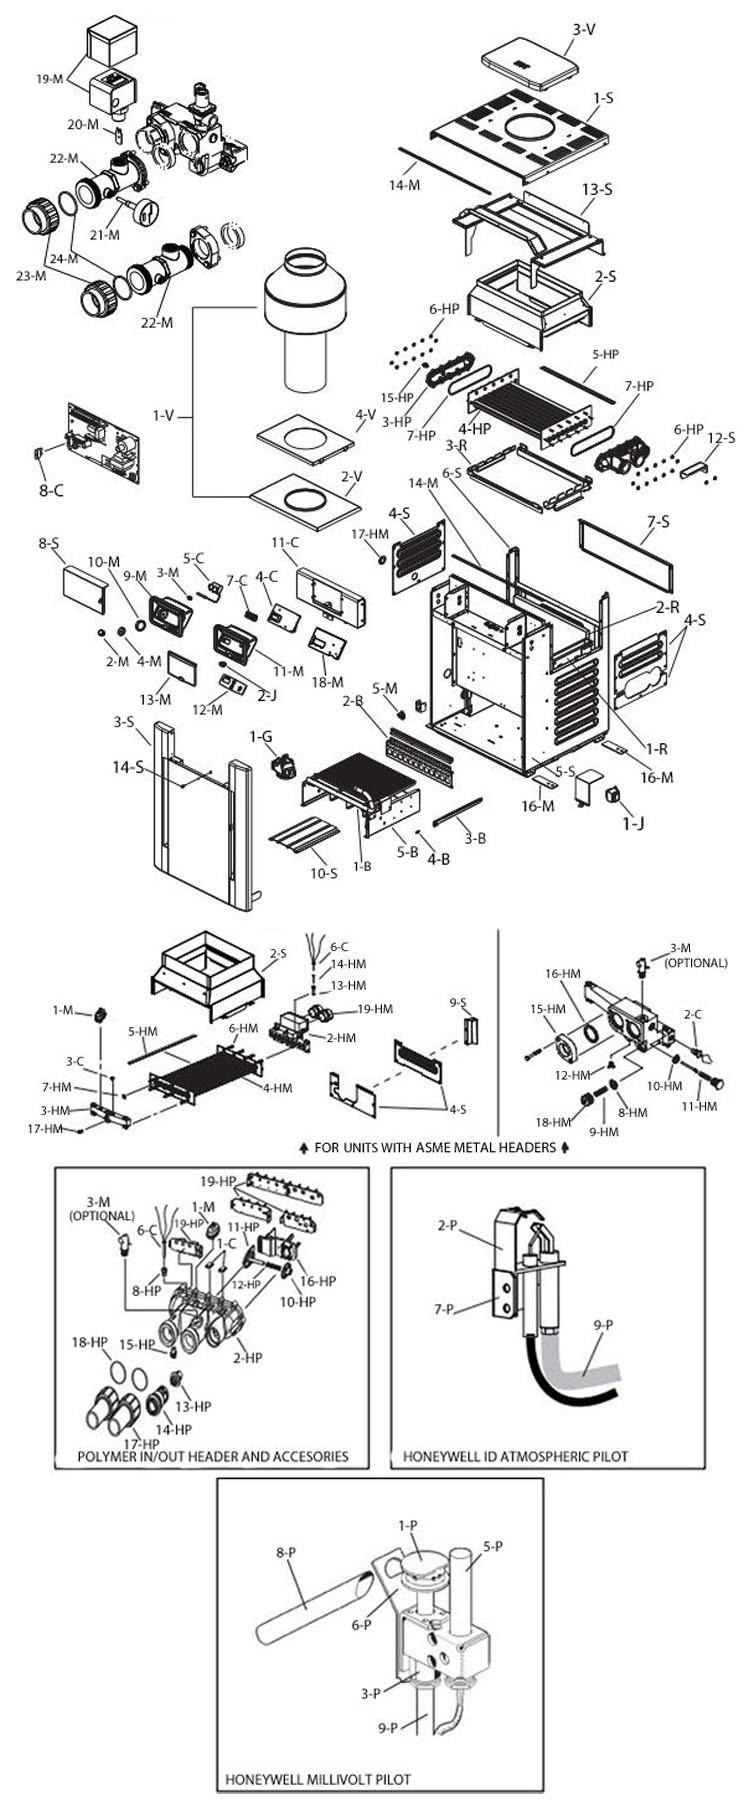 Raypak Digital Natural Gas Pool Heater 336k BTU   Electronic Ignition   P-R336A-EN-C 009218 P-M336A-EN-C 009964 Parts Schematic